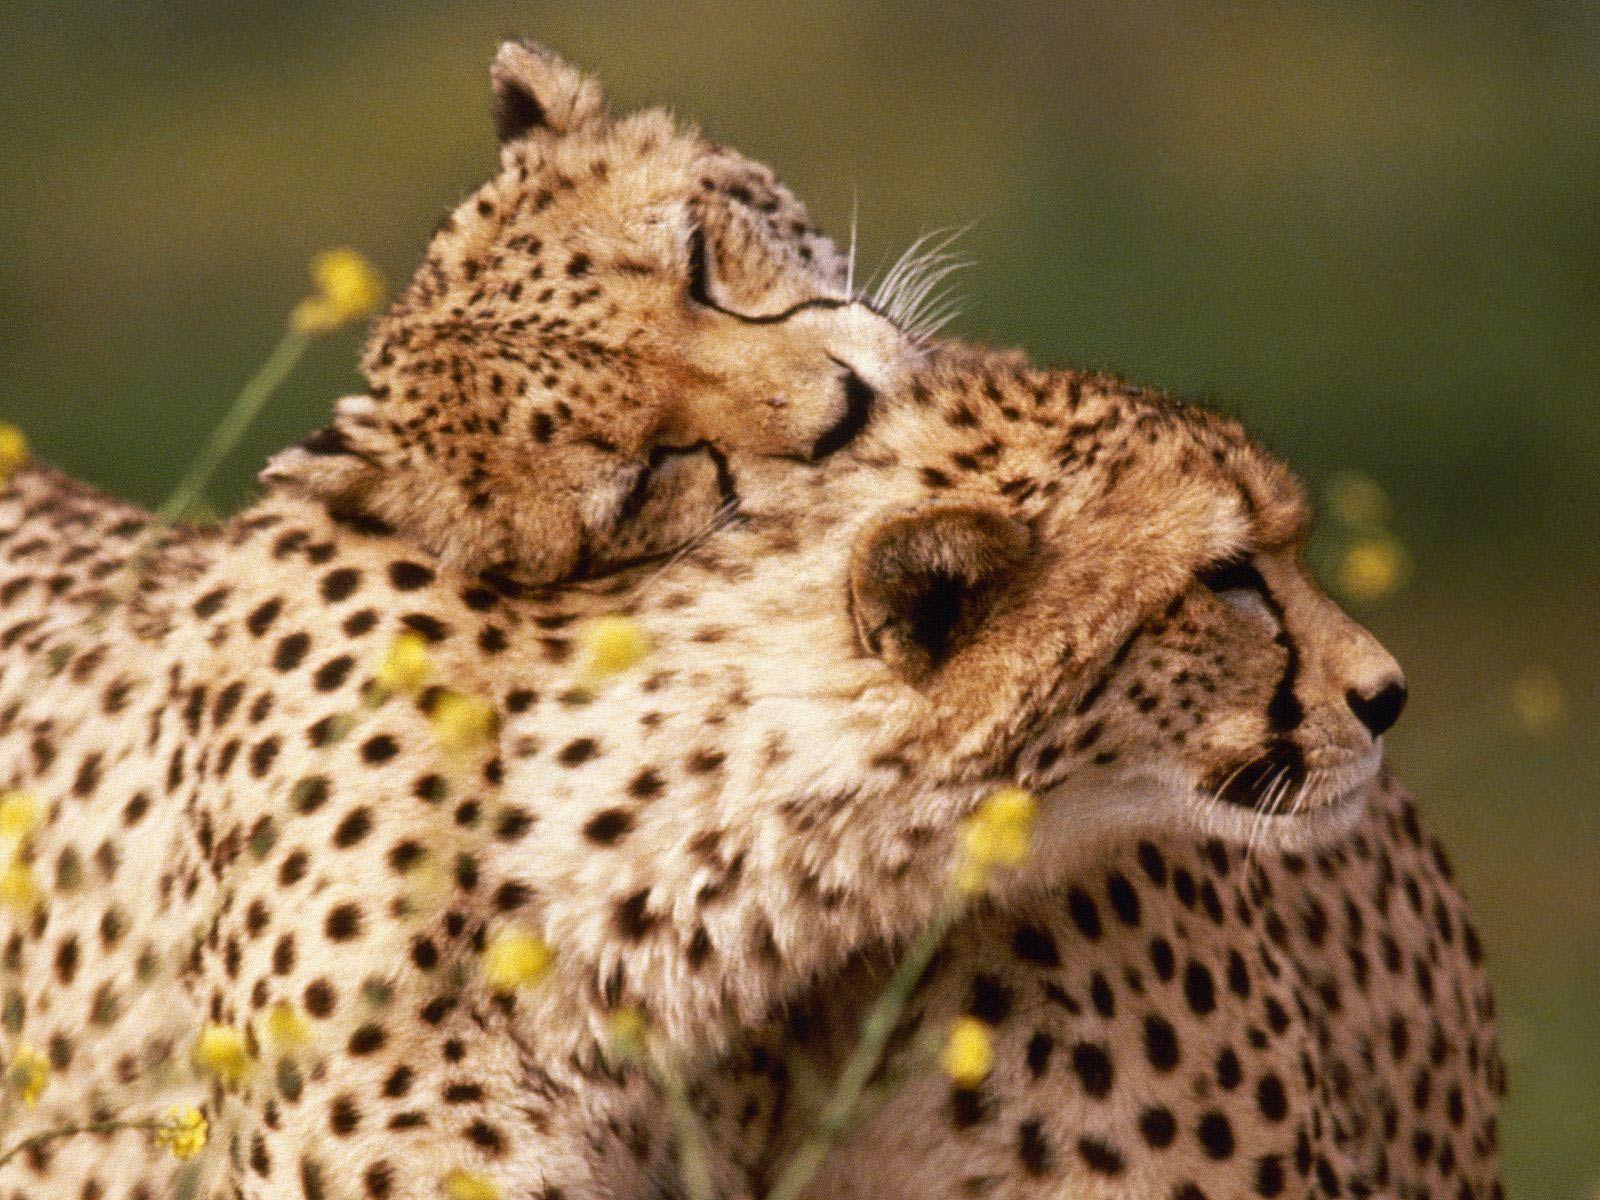 Cheetahs animal bird kingdom pinterest cheetahs cheetah hug a friend day 38 cute animals hugging voltagebd Image collections